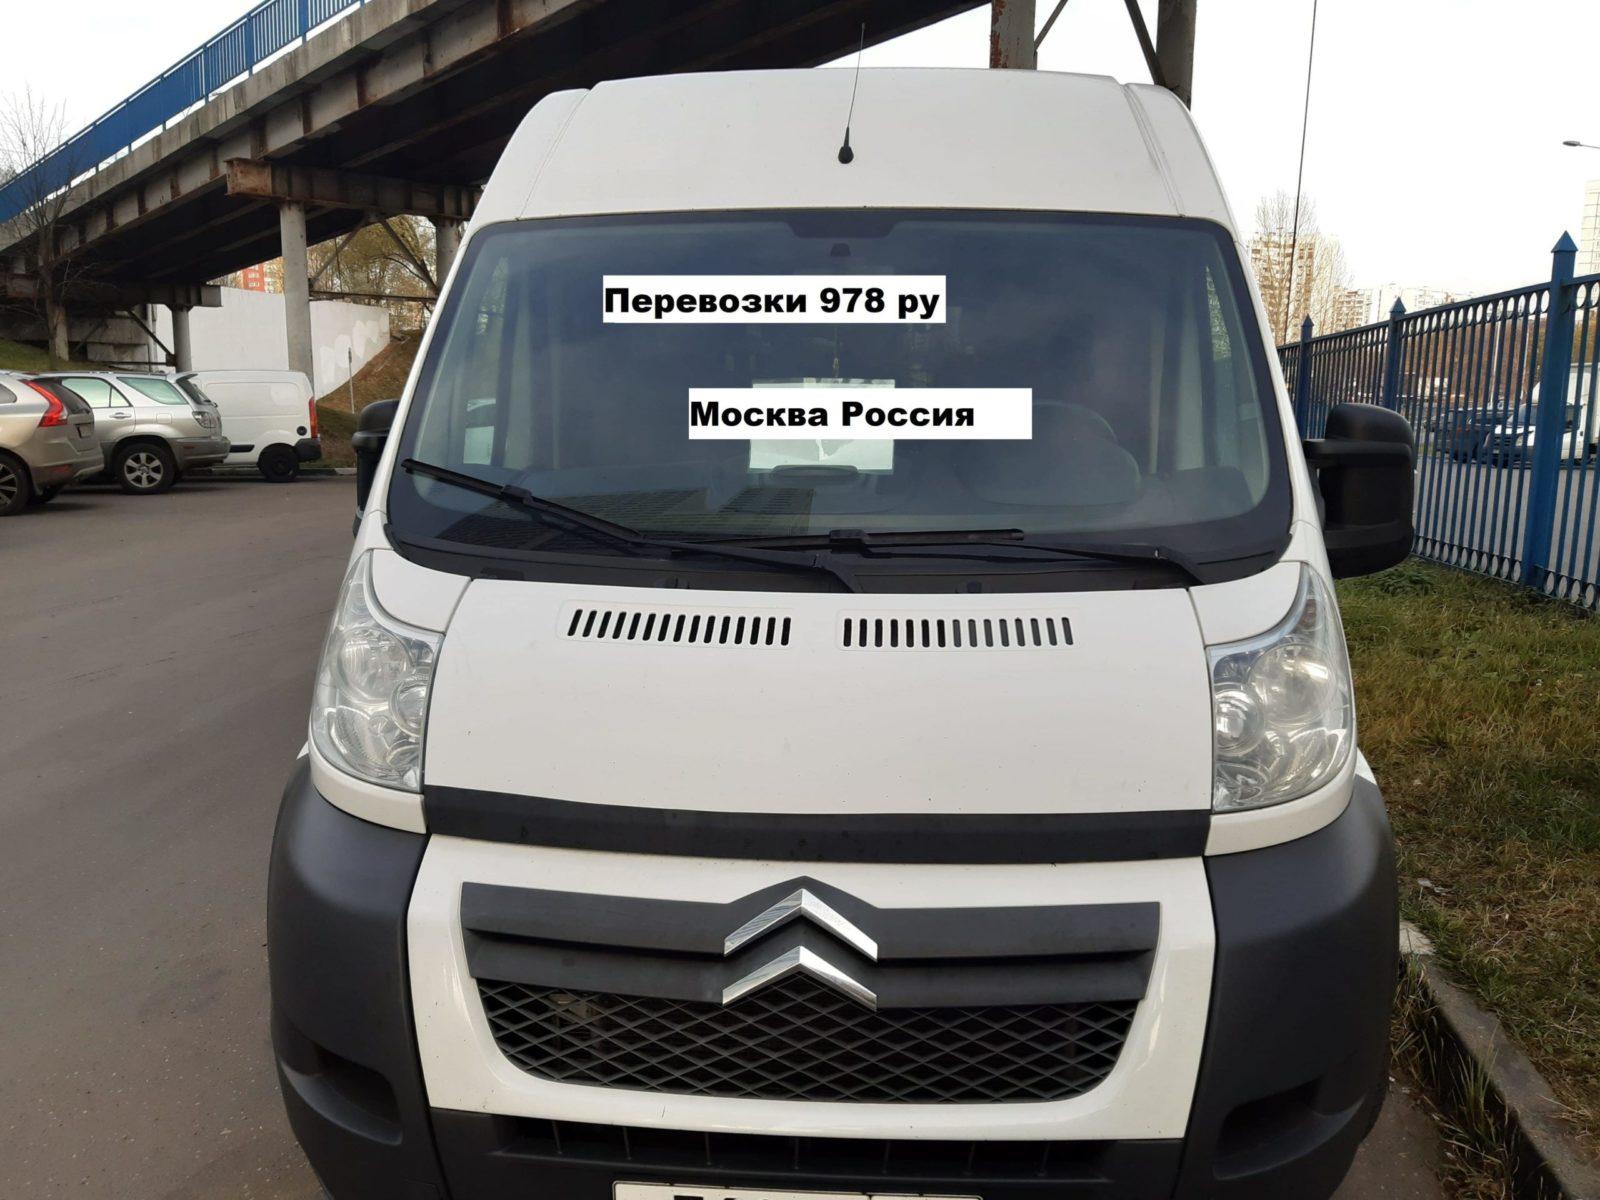 Москва Россия перевозки - микроавтобус | «Перевозки 978»